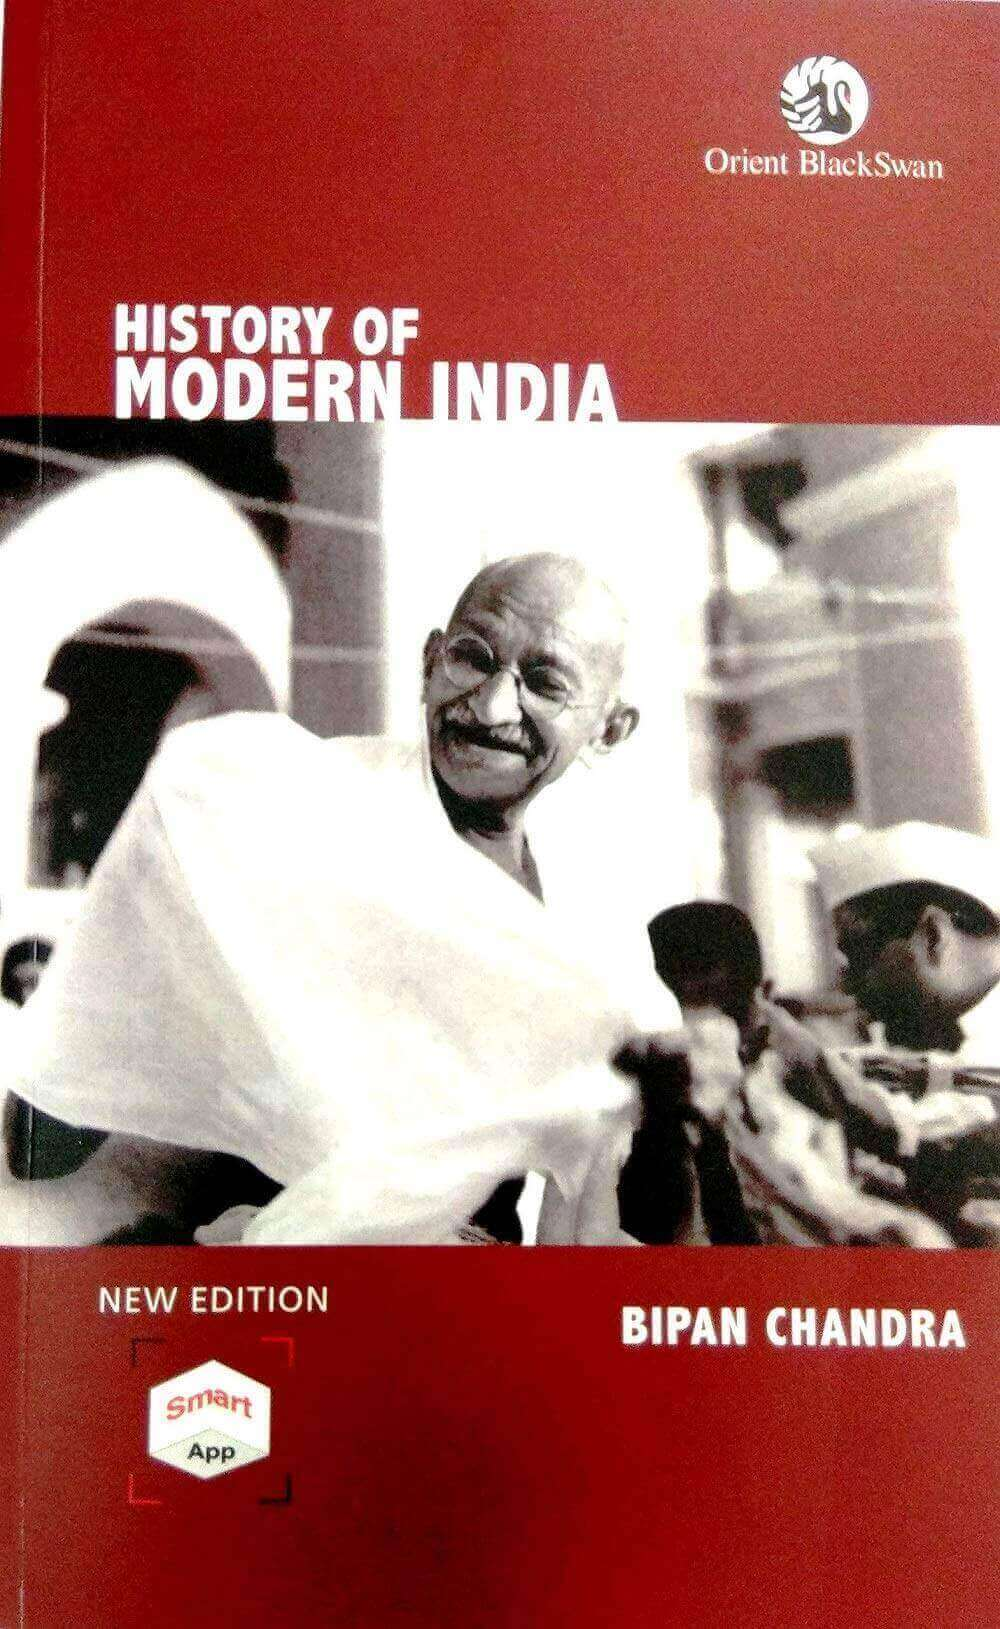 History of Modern India by Bipan Chandra